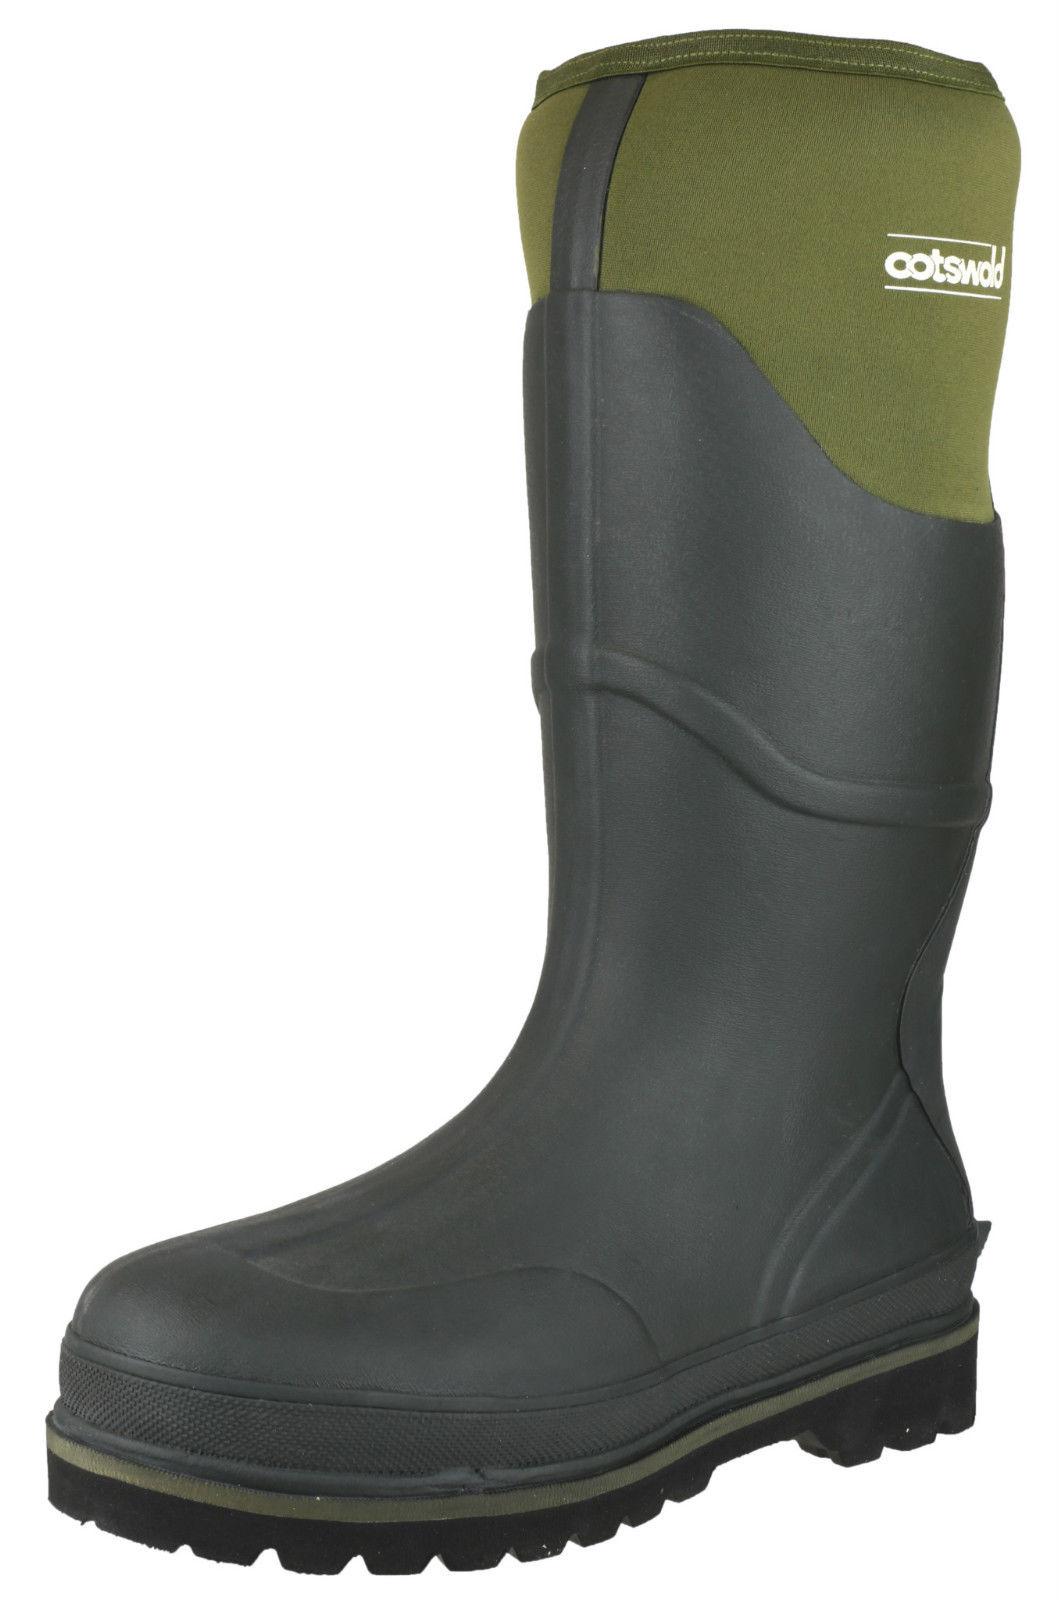 Cotswold Cotswold Cotswold Verde Ranger neoprene Hombre rubber waterproof wellington botas Talla 6-14 d2d64f